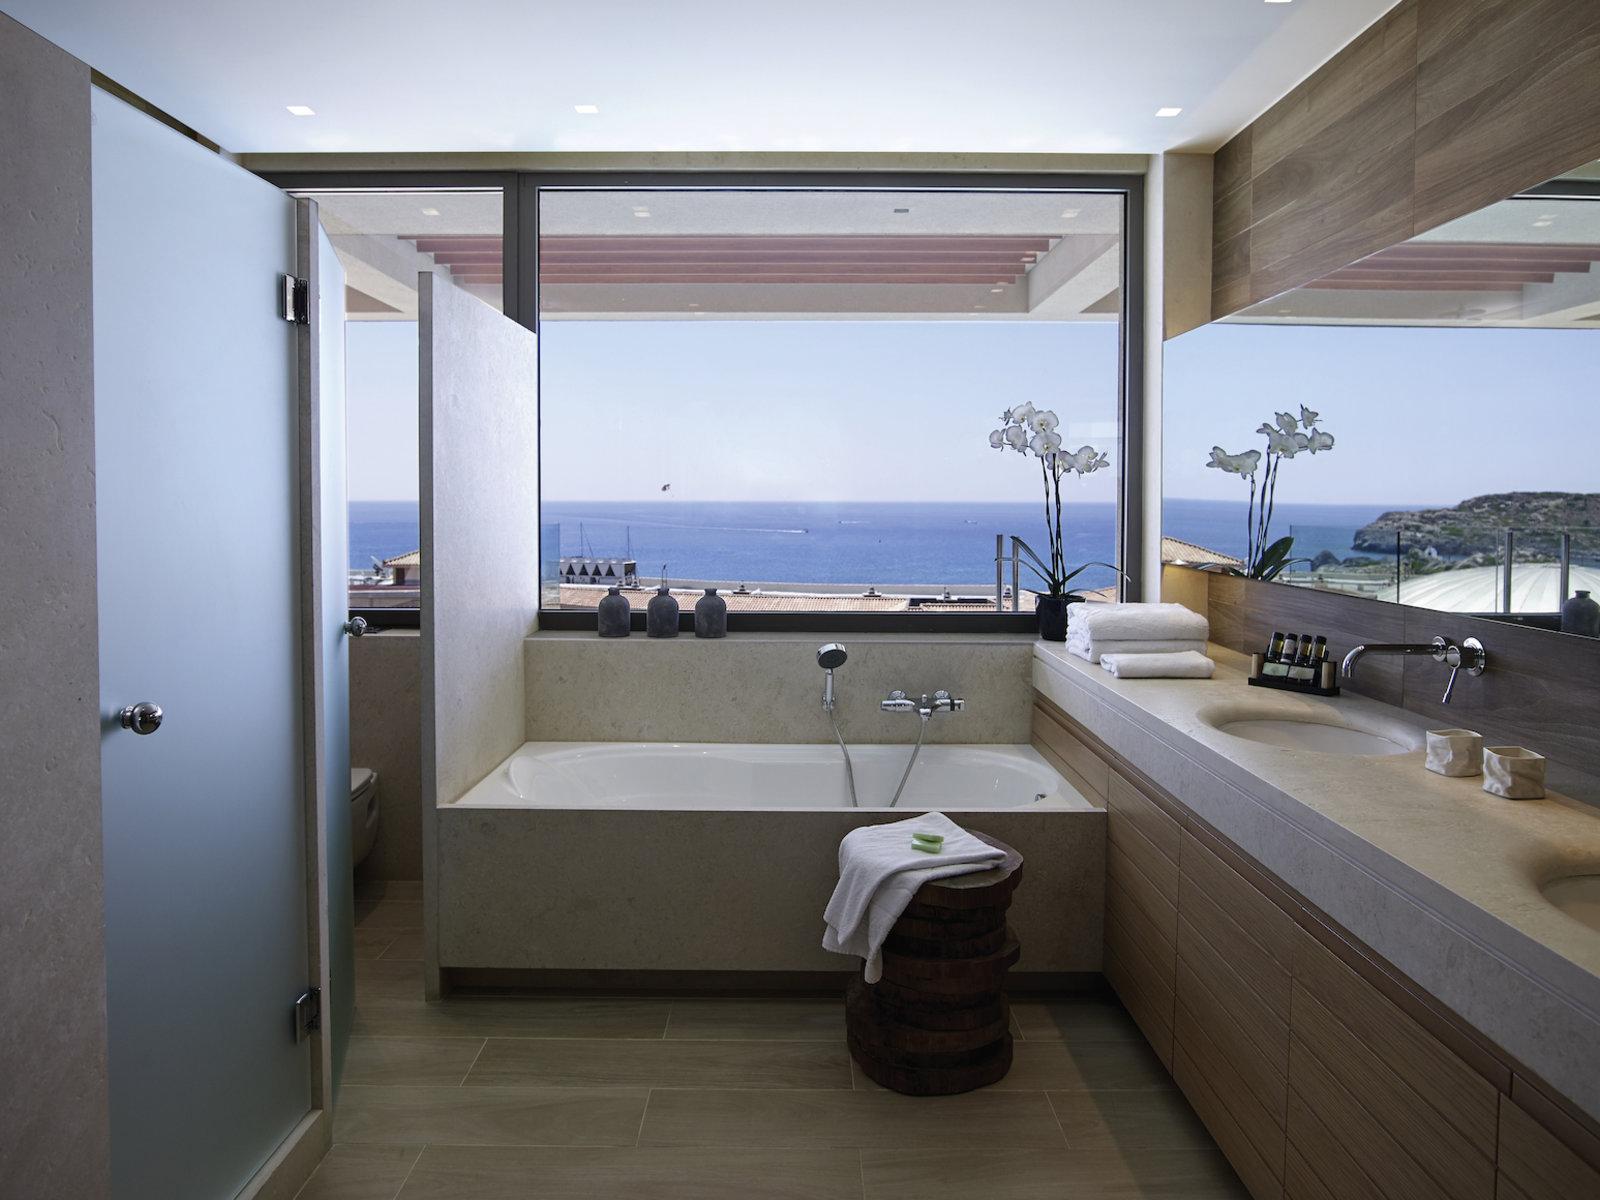 Wohnbeispiel One Bed room Suite private Pool red carpet